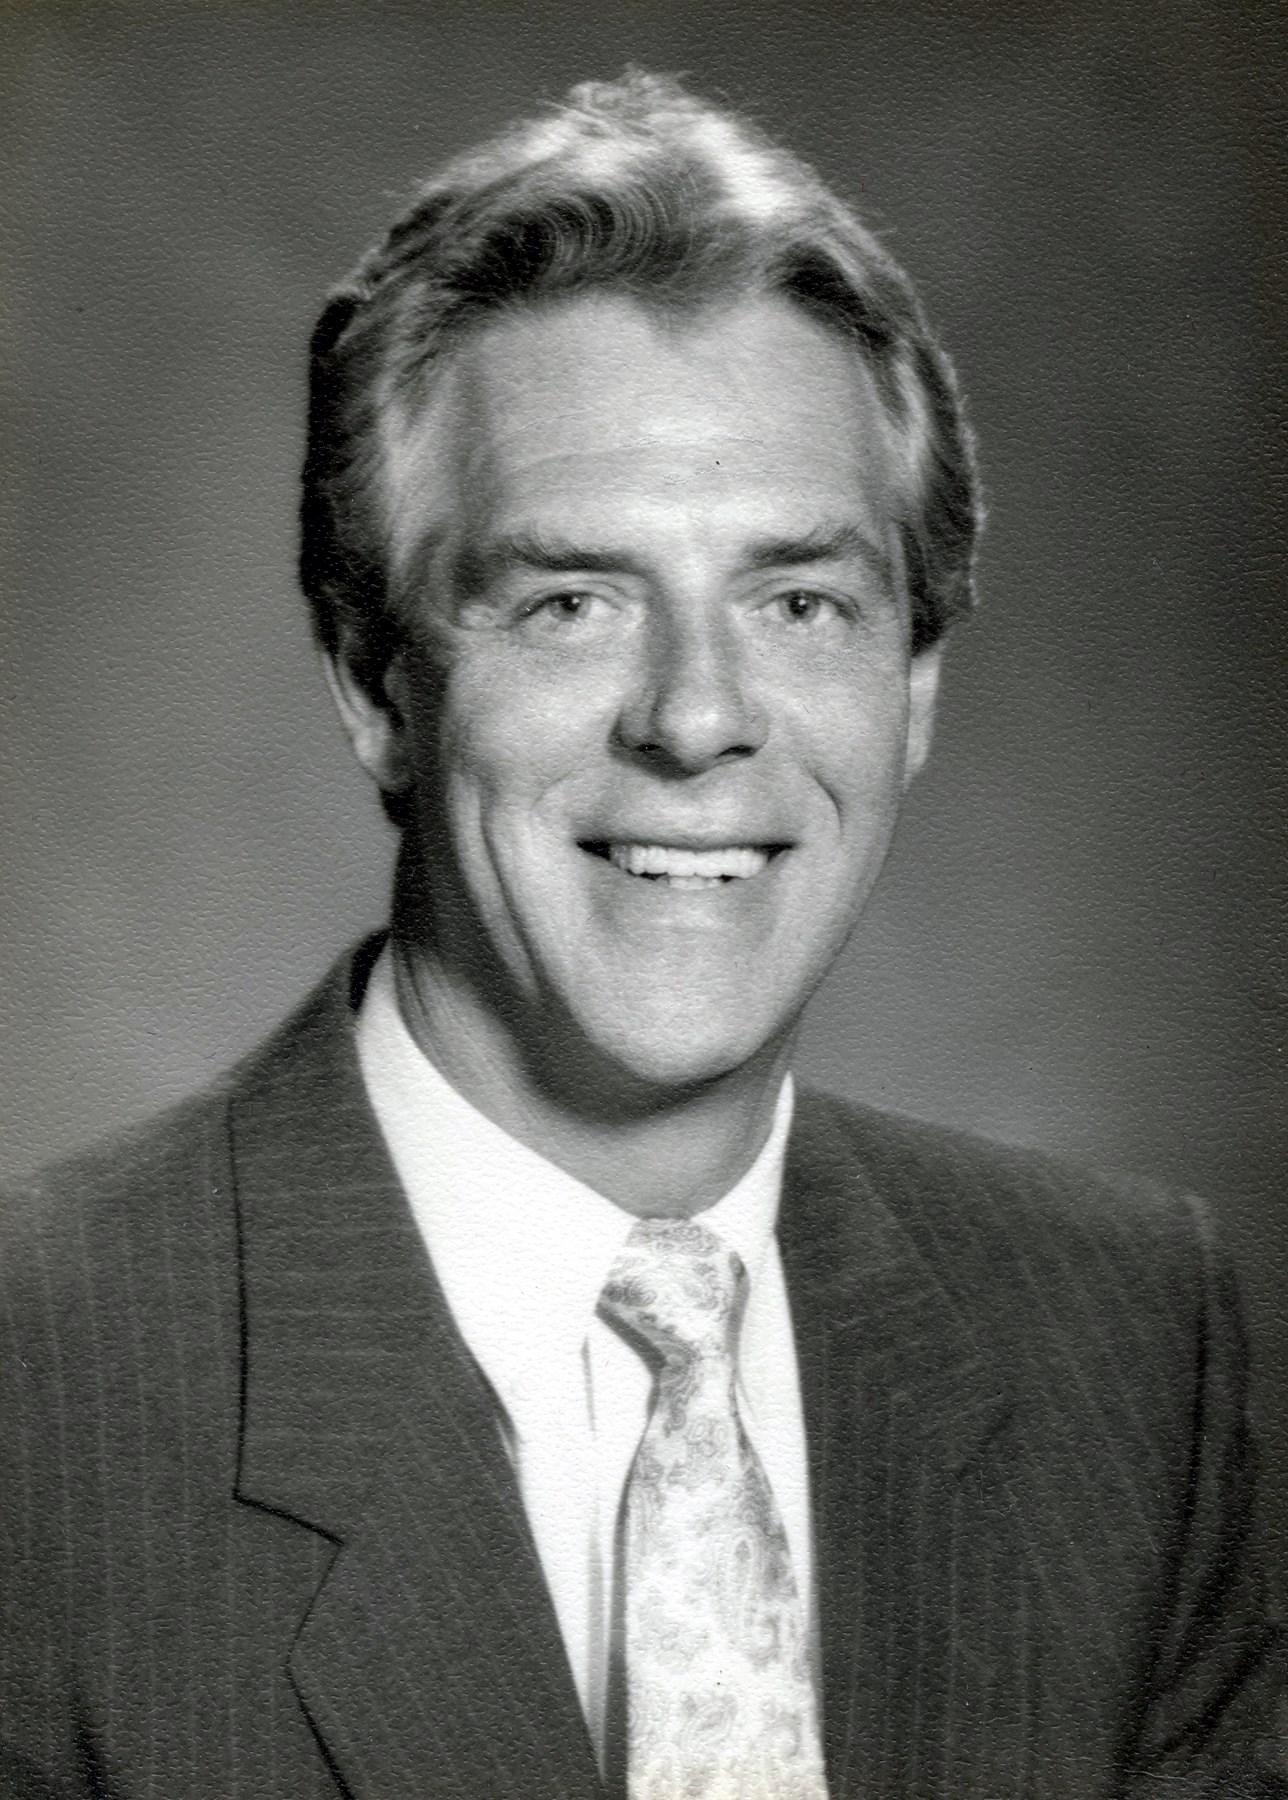 John Michael  Hough